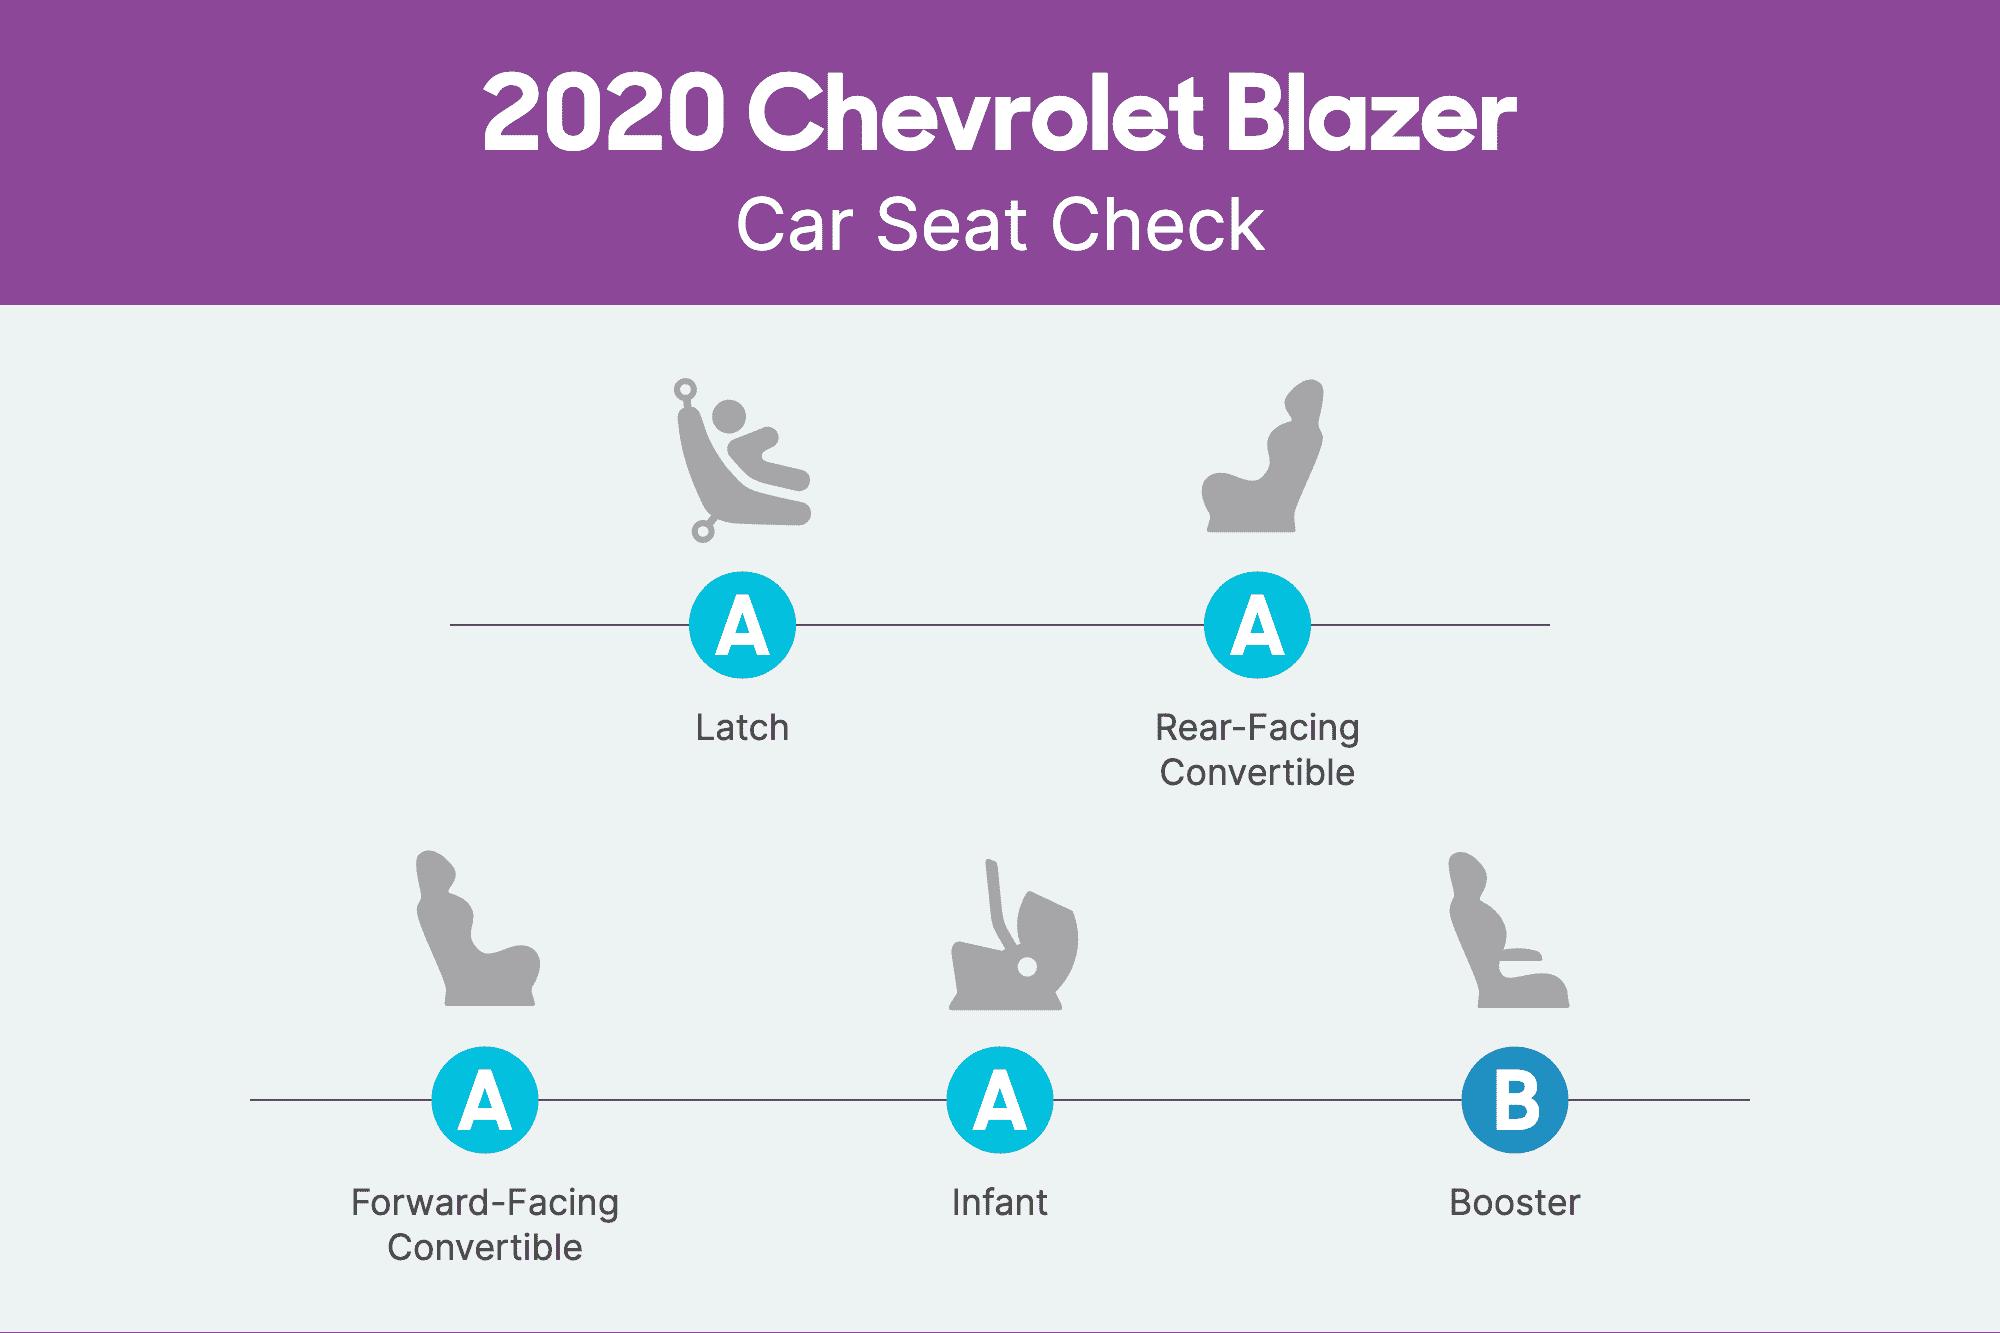 chevrolet-blazer-2020-csc-scorecard.png